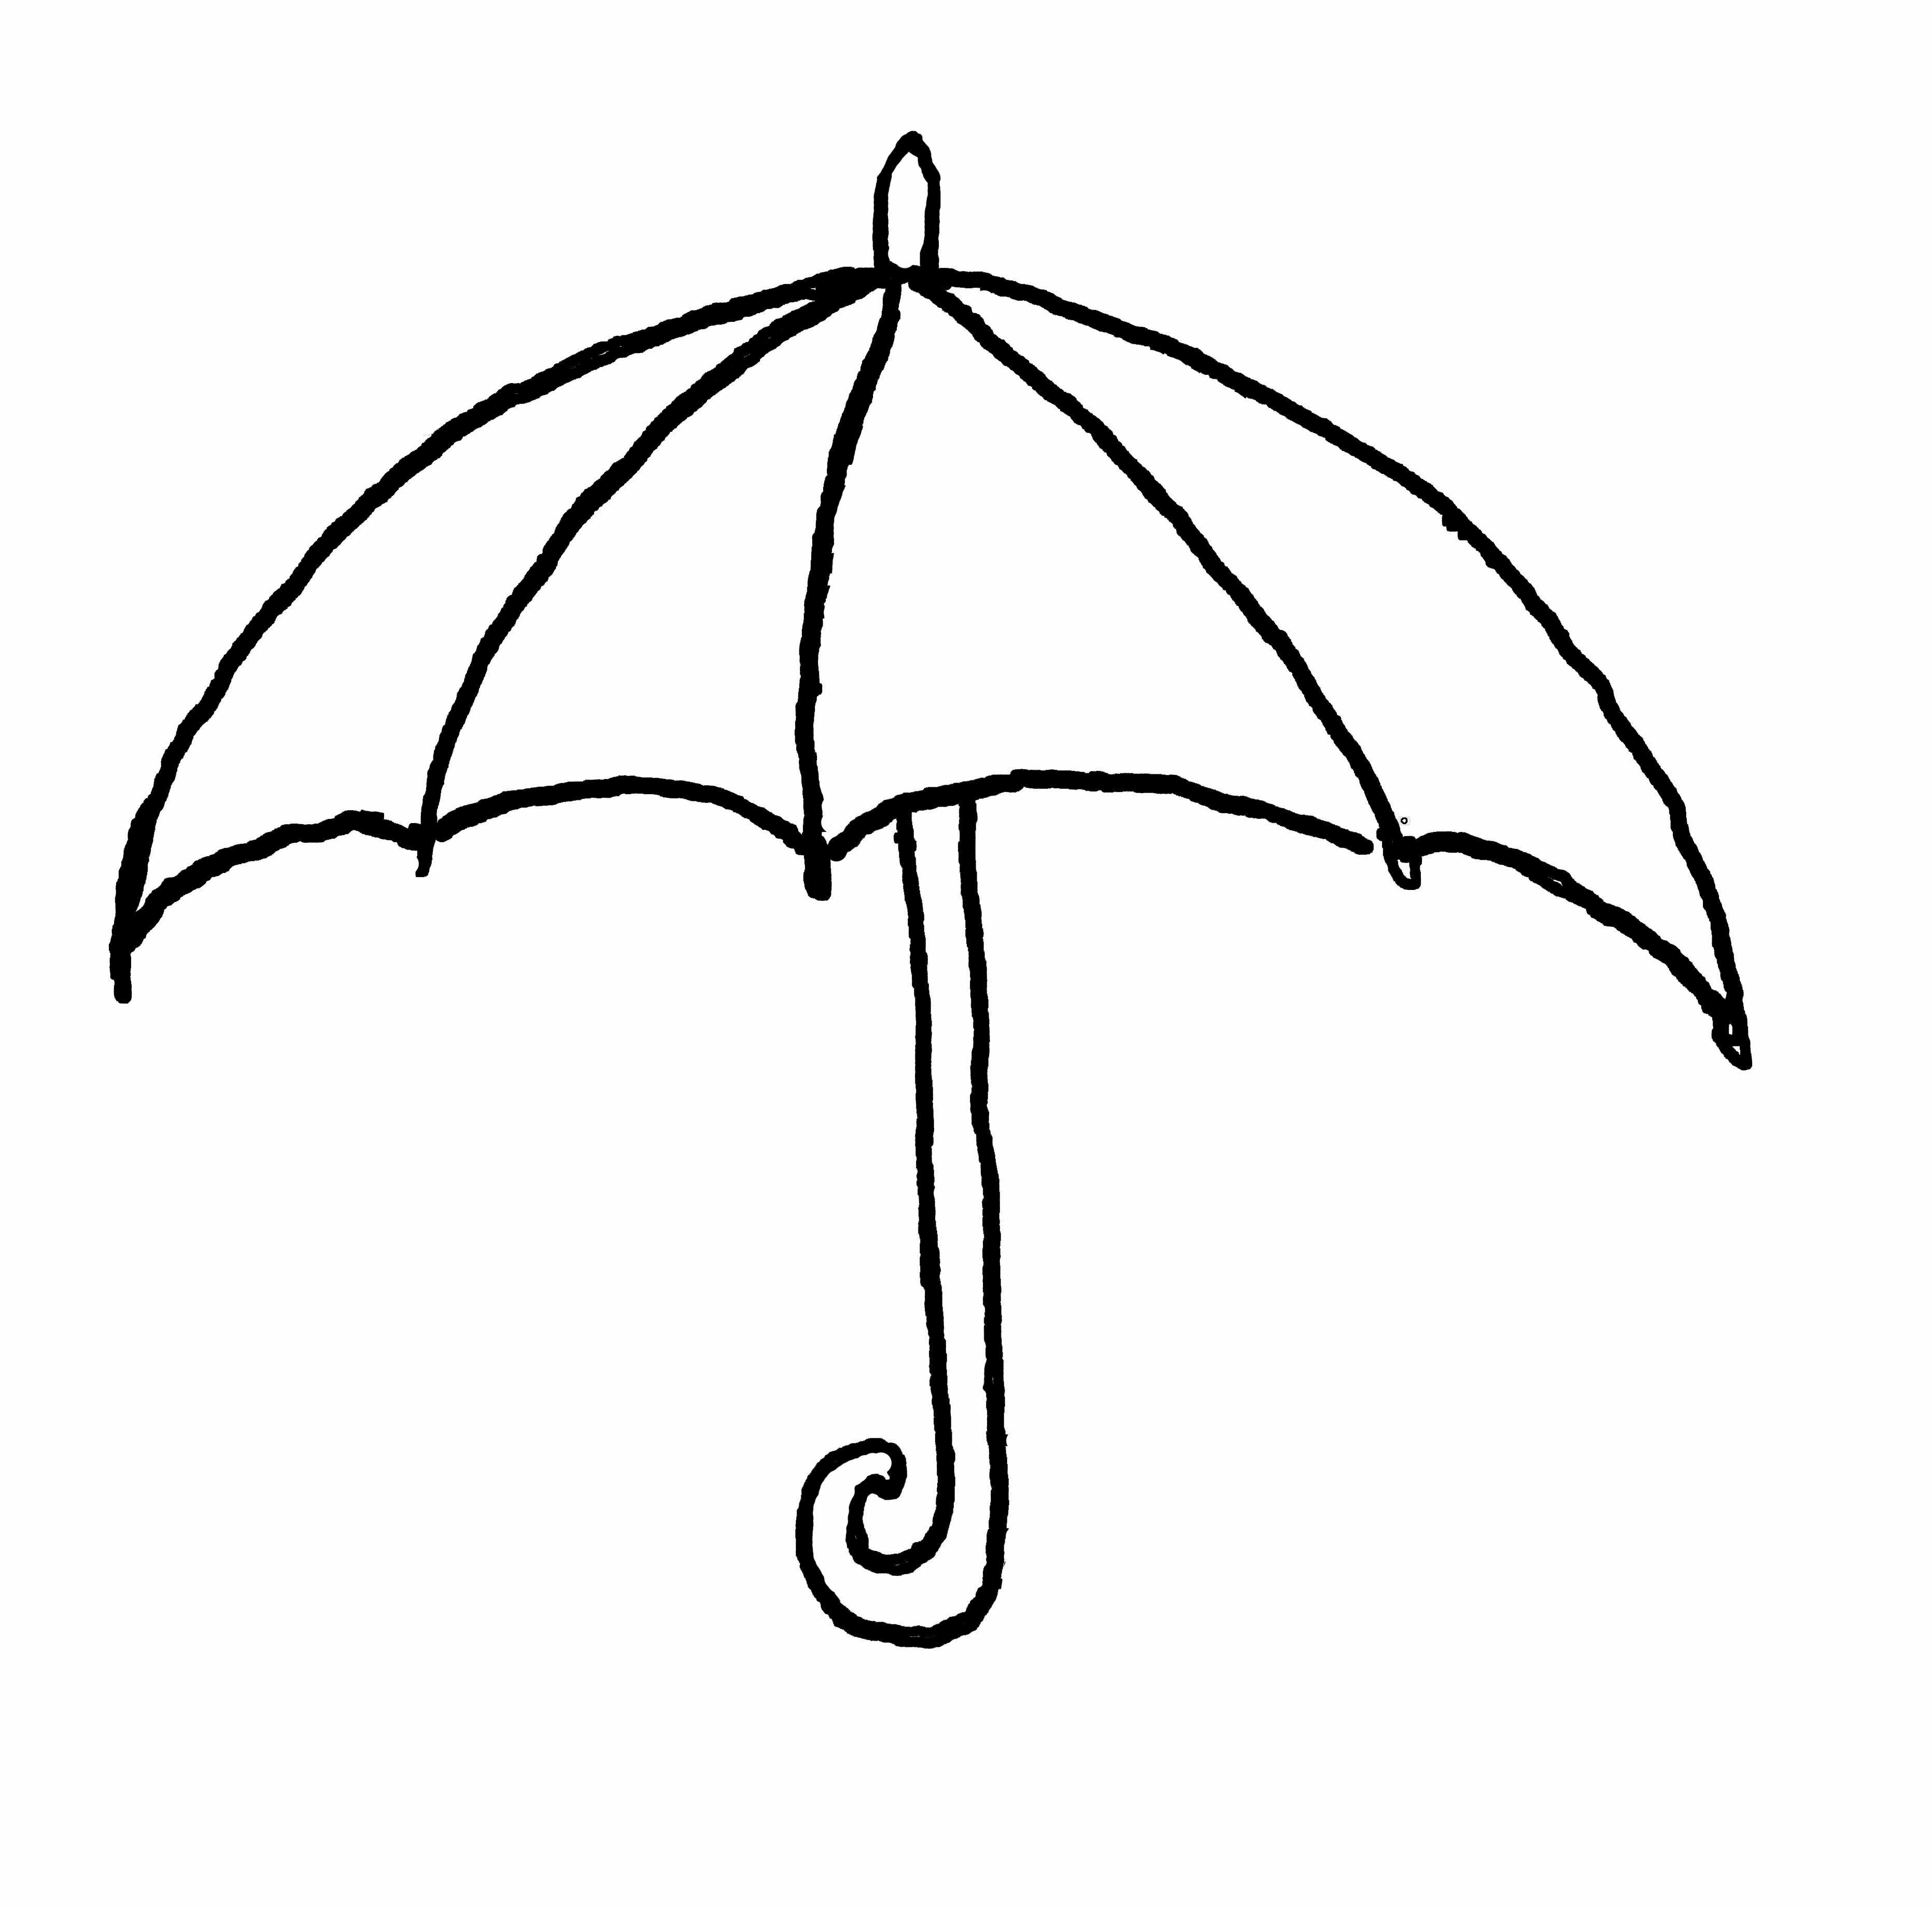 kleurplaat paraplu www dewereldvanwiepje nl kleurplaten